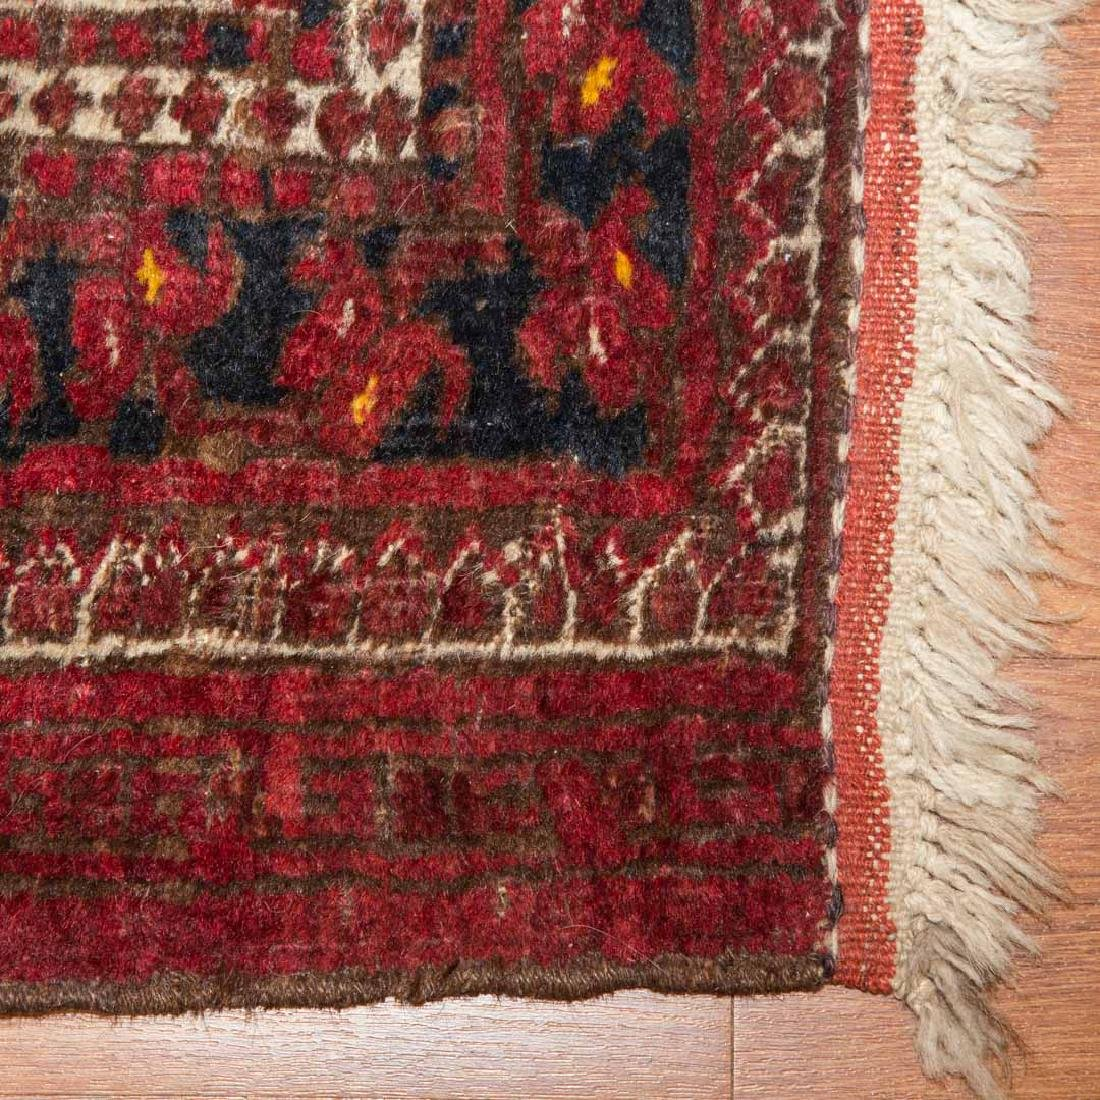 Two Afghani tribal rugs, Afghanistan, circa 1960 - 2